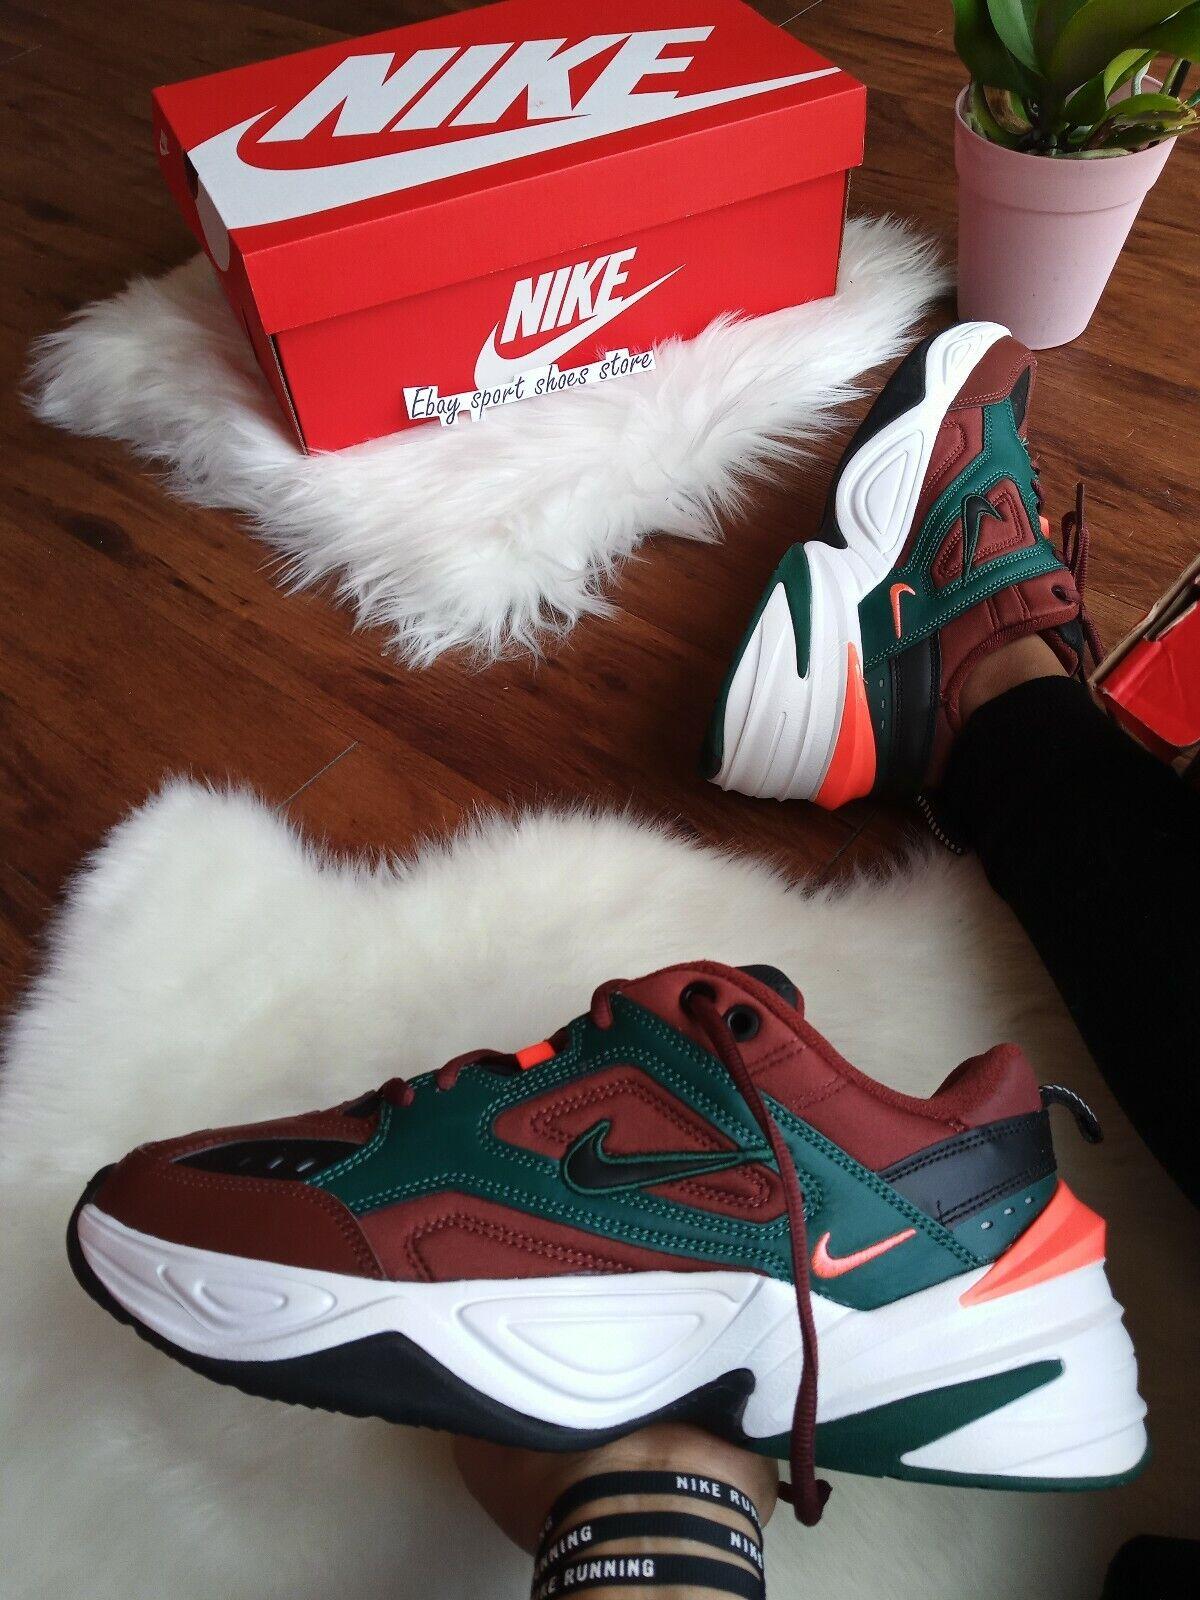 Size 8 Men's  Nike M2K Tekno Athletic Fashion Sneakers AV4789 200 PUEBLO BROWN